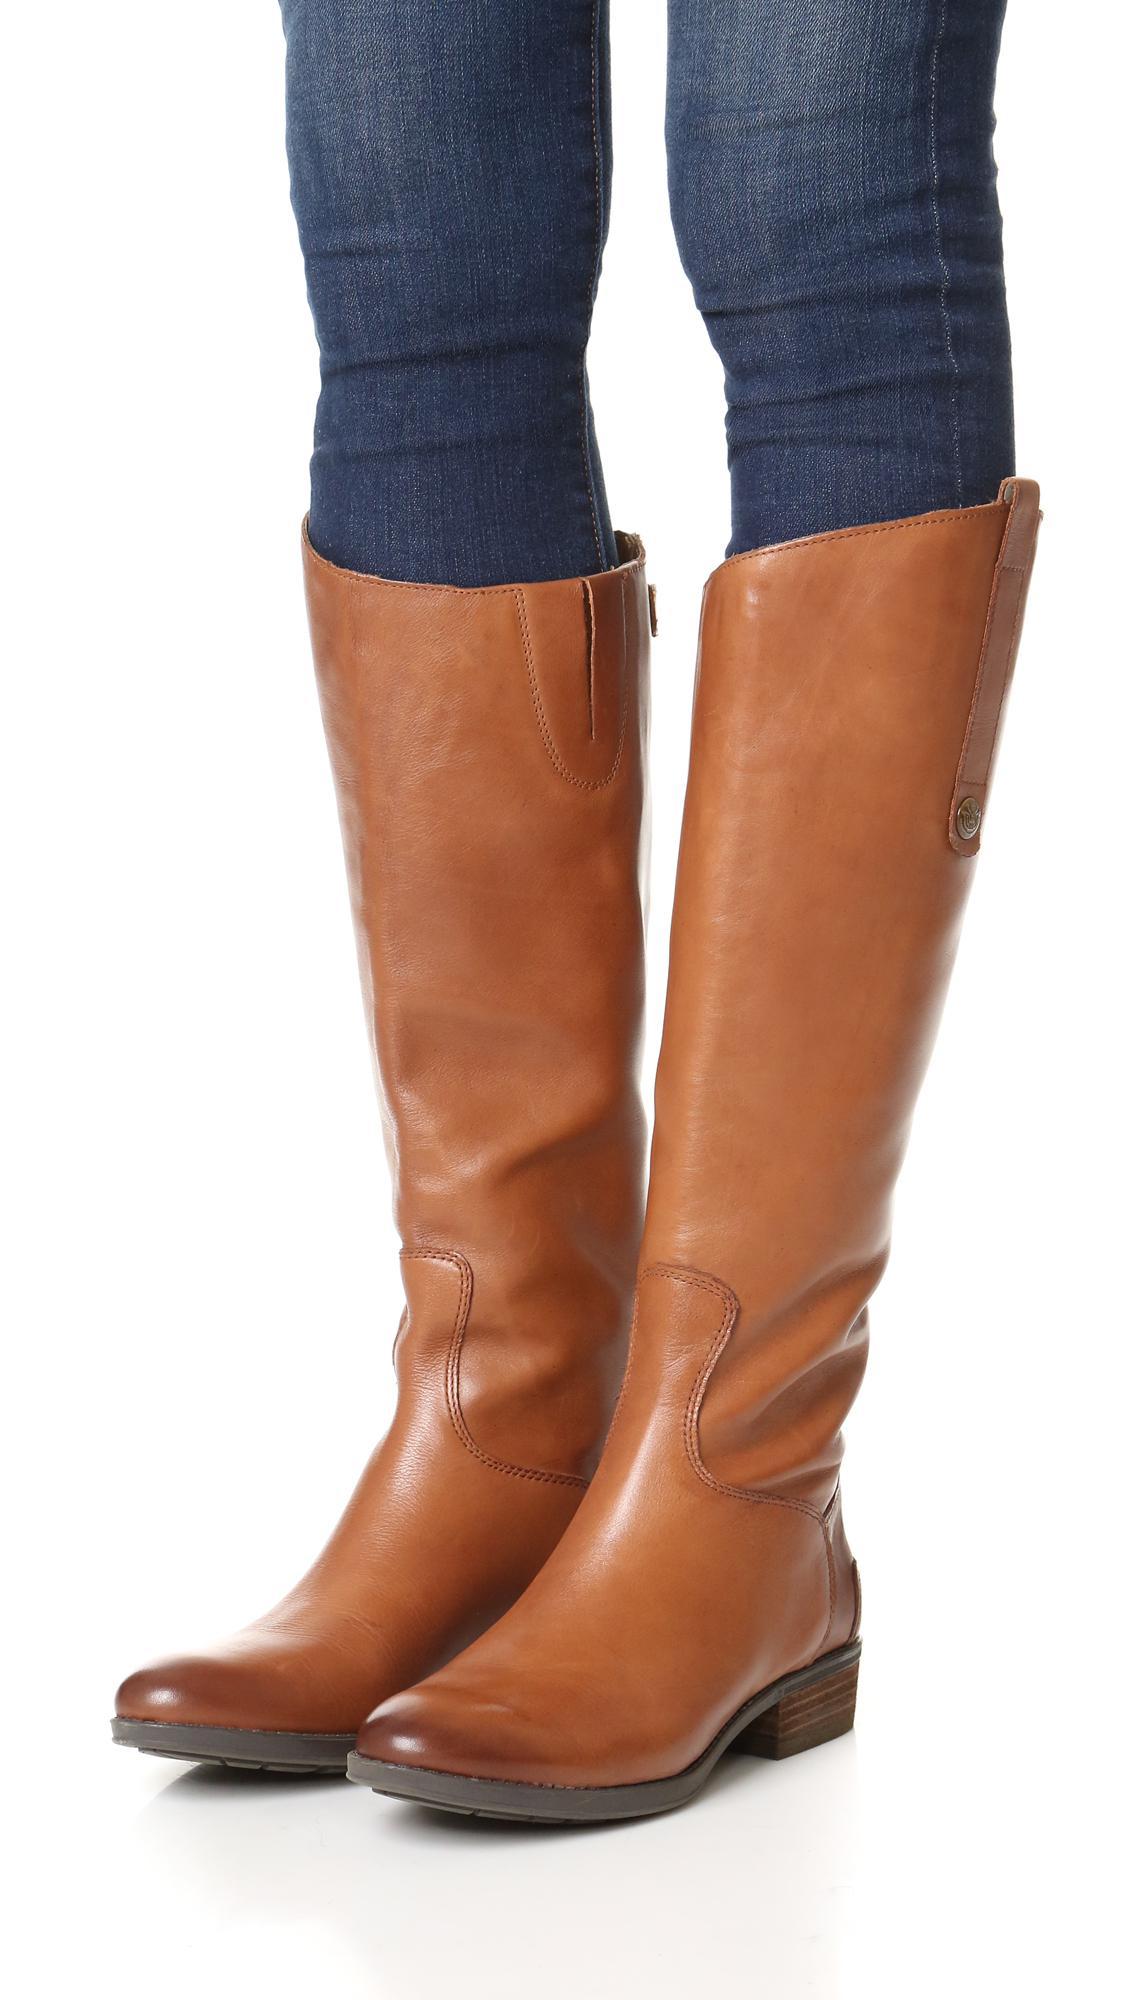 c4e5c00947105 Sam Edelman - Brown Penny Riding Boots - Lyst. View fullscreen